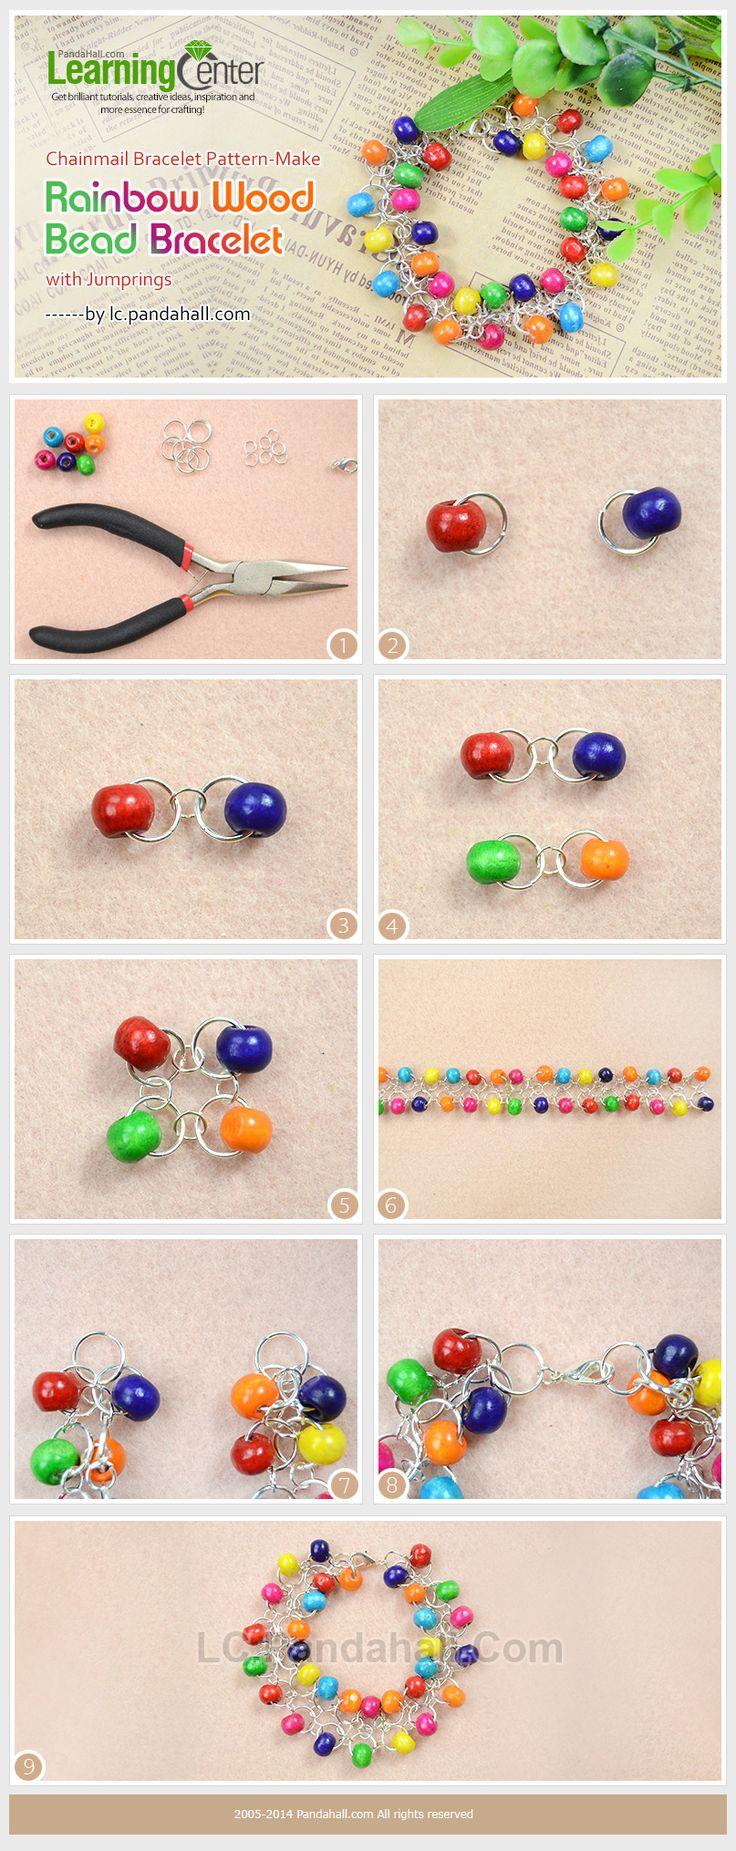 Chainmail Bracelet Pattern-Make Rainbow Wood Bead Bracelet with Jumprings